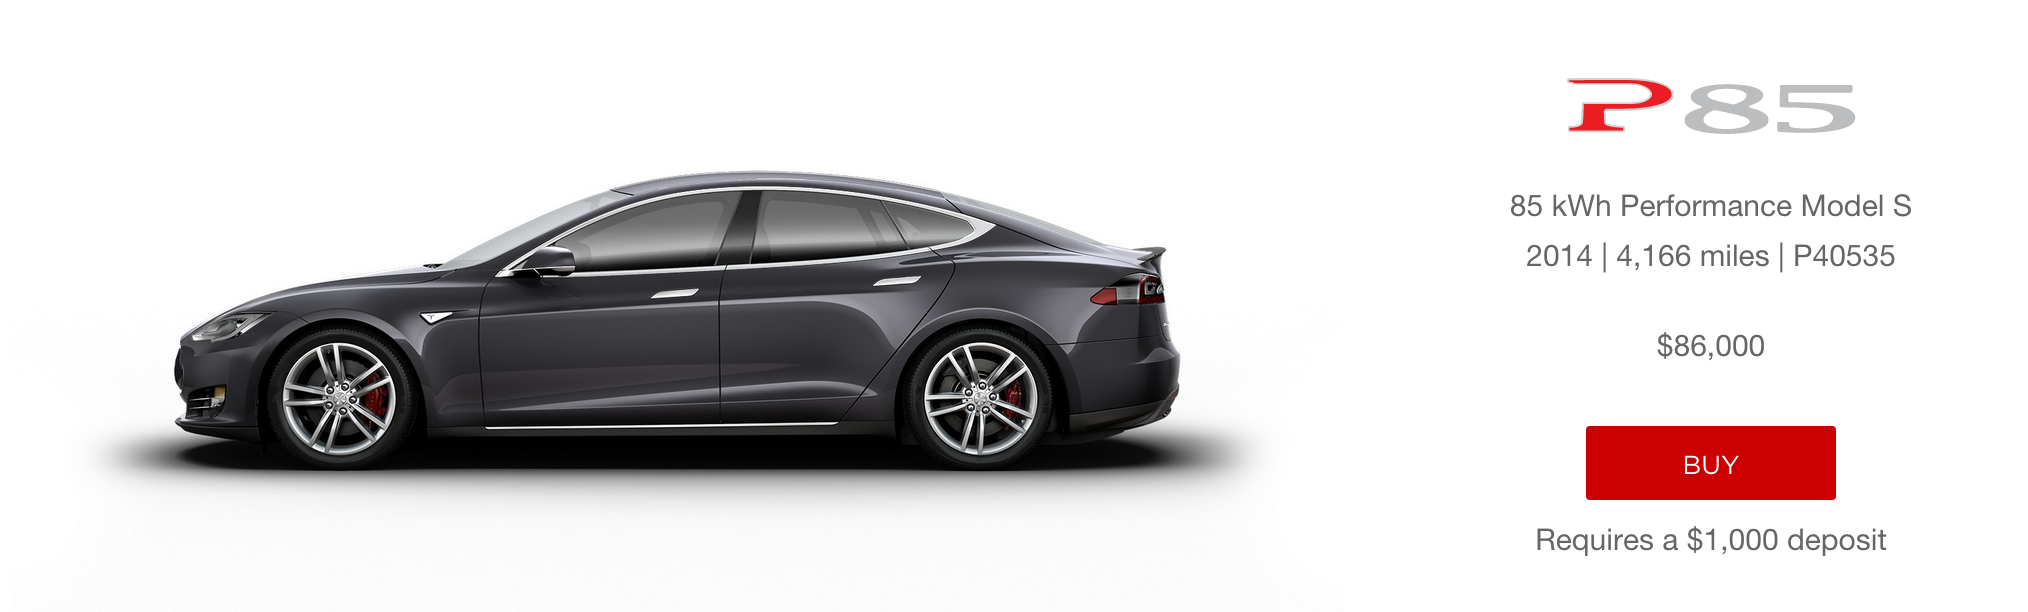 Tesla motors cleveland